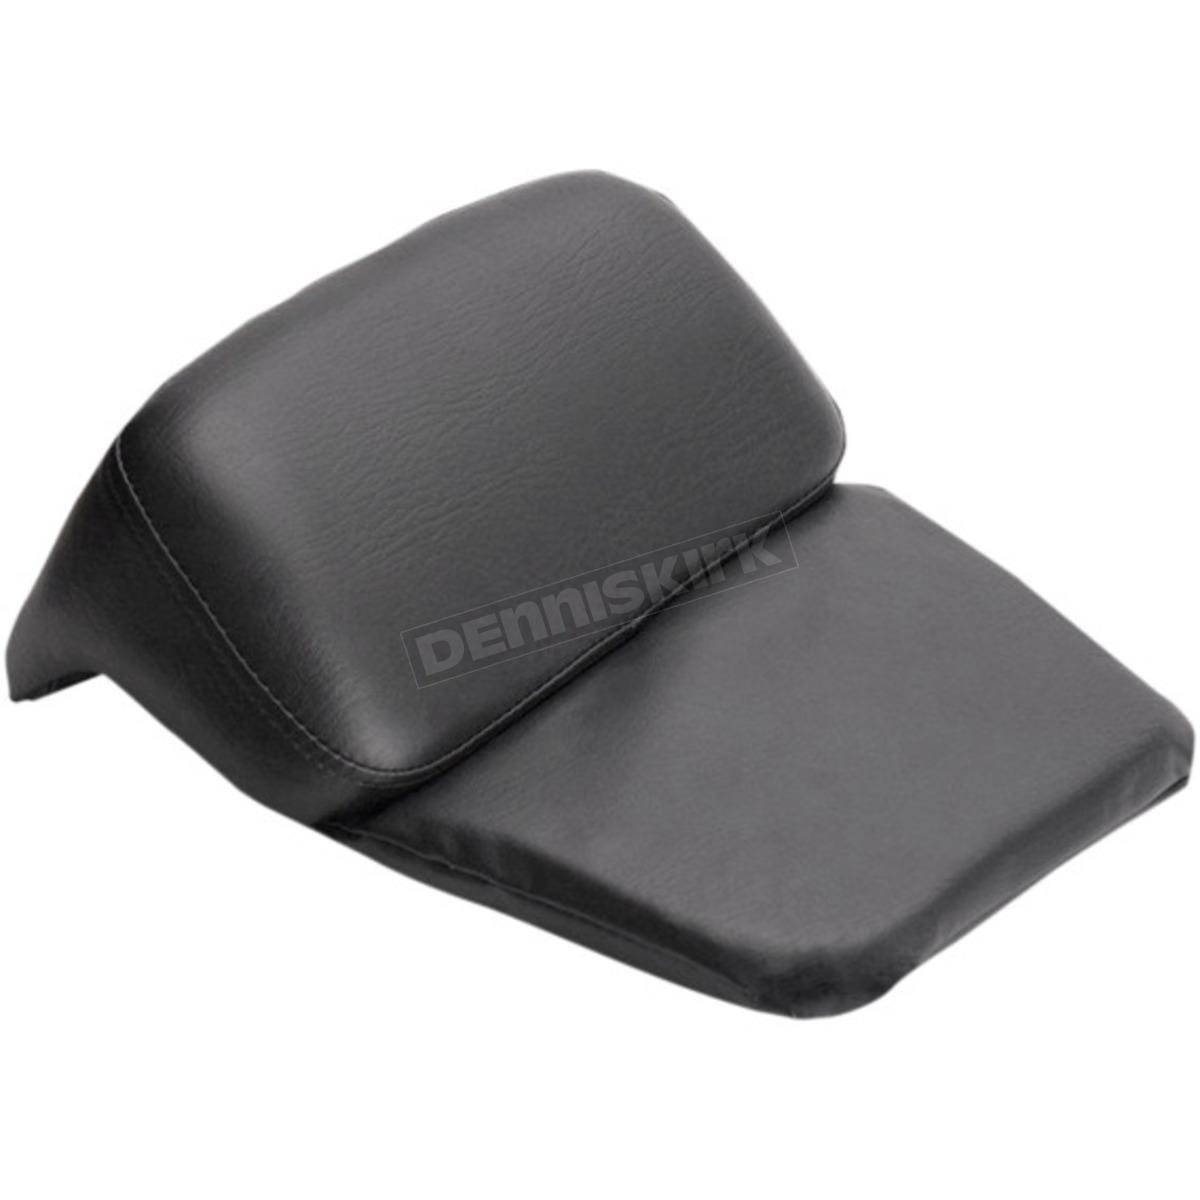 road sofa seat goldwing softline lazy bed saddlemen pillow top chopped tour pak pad cover